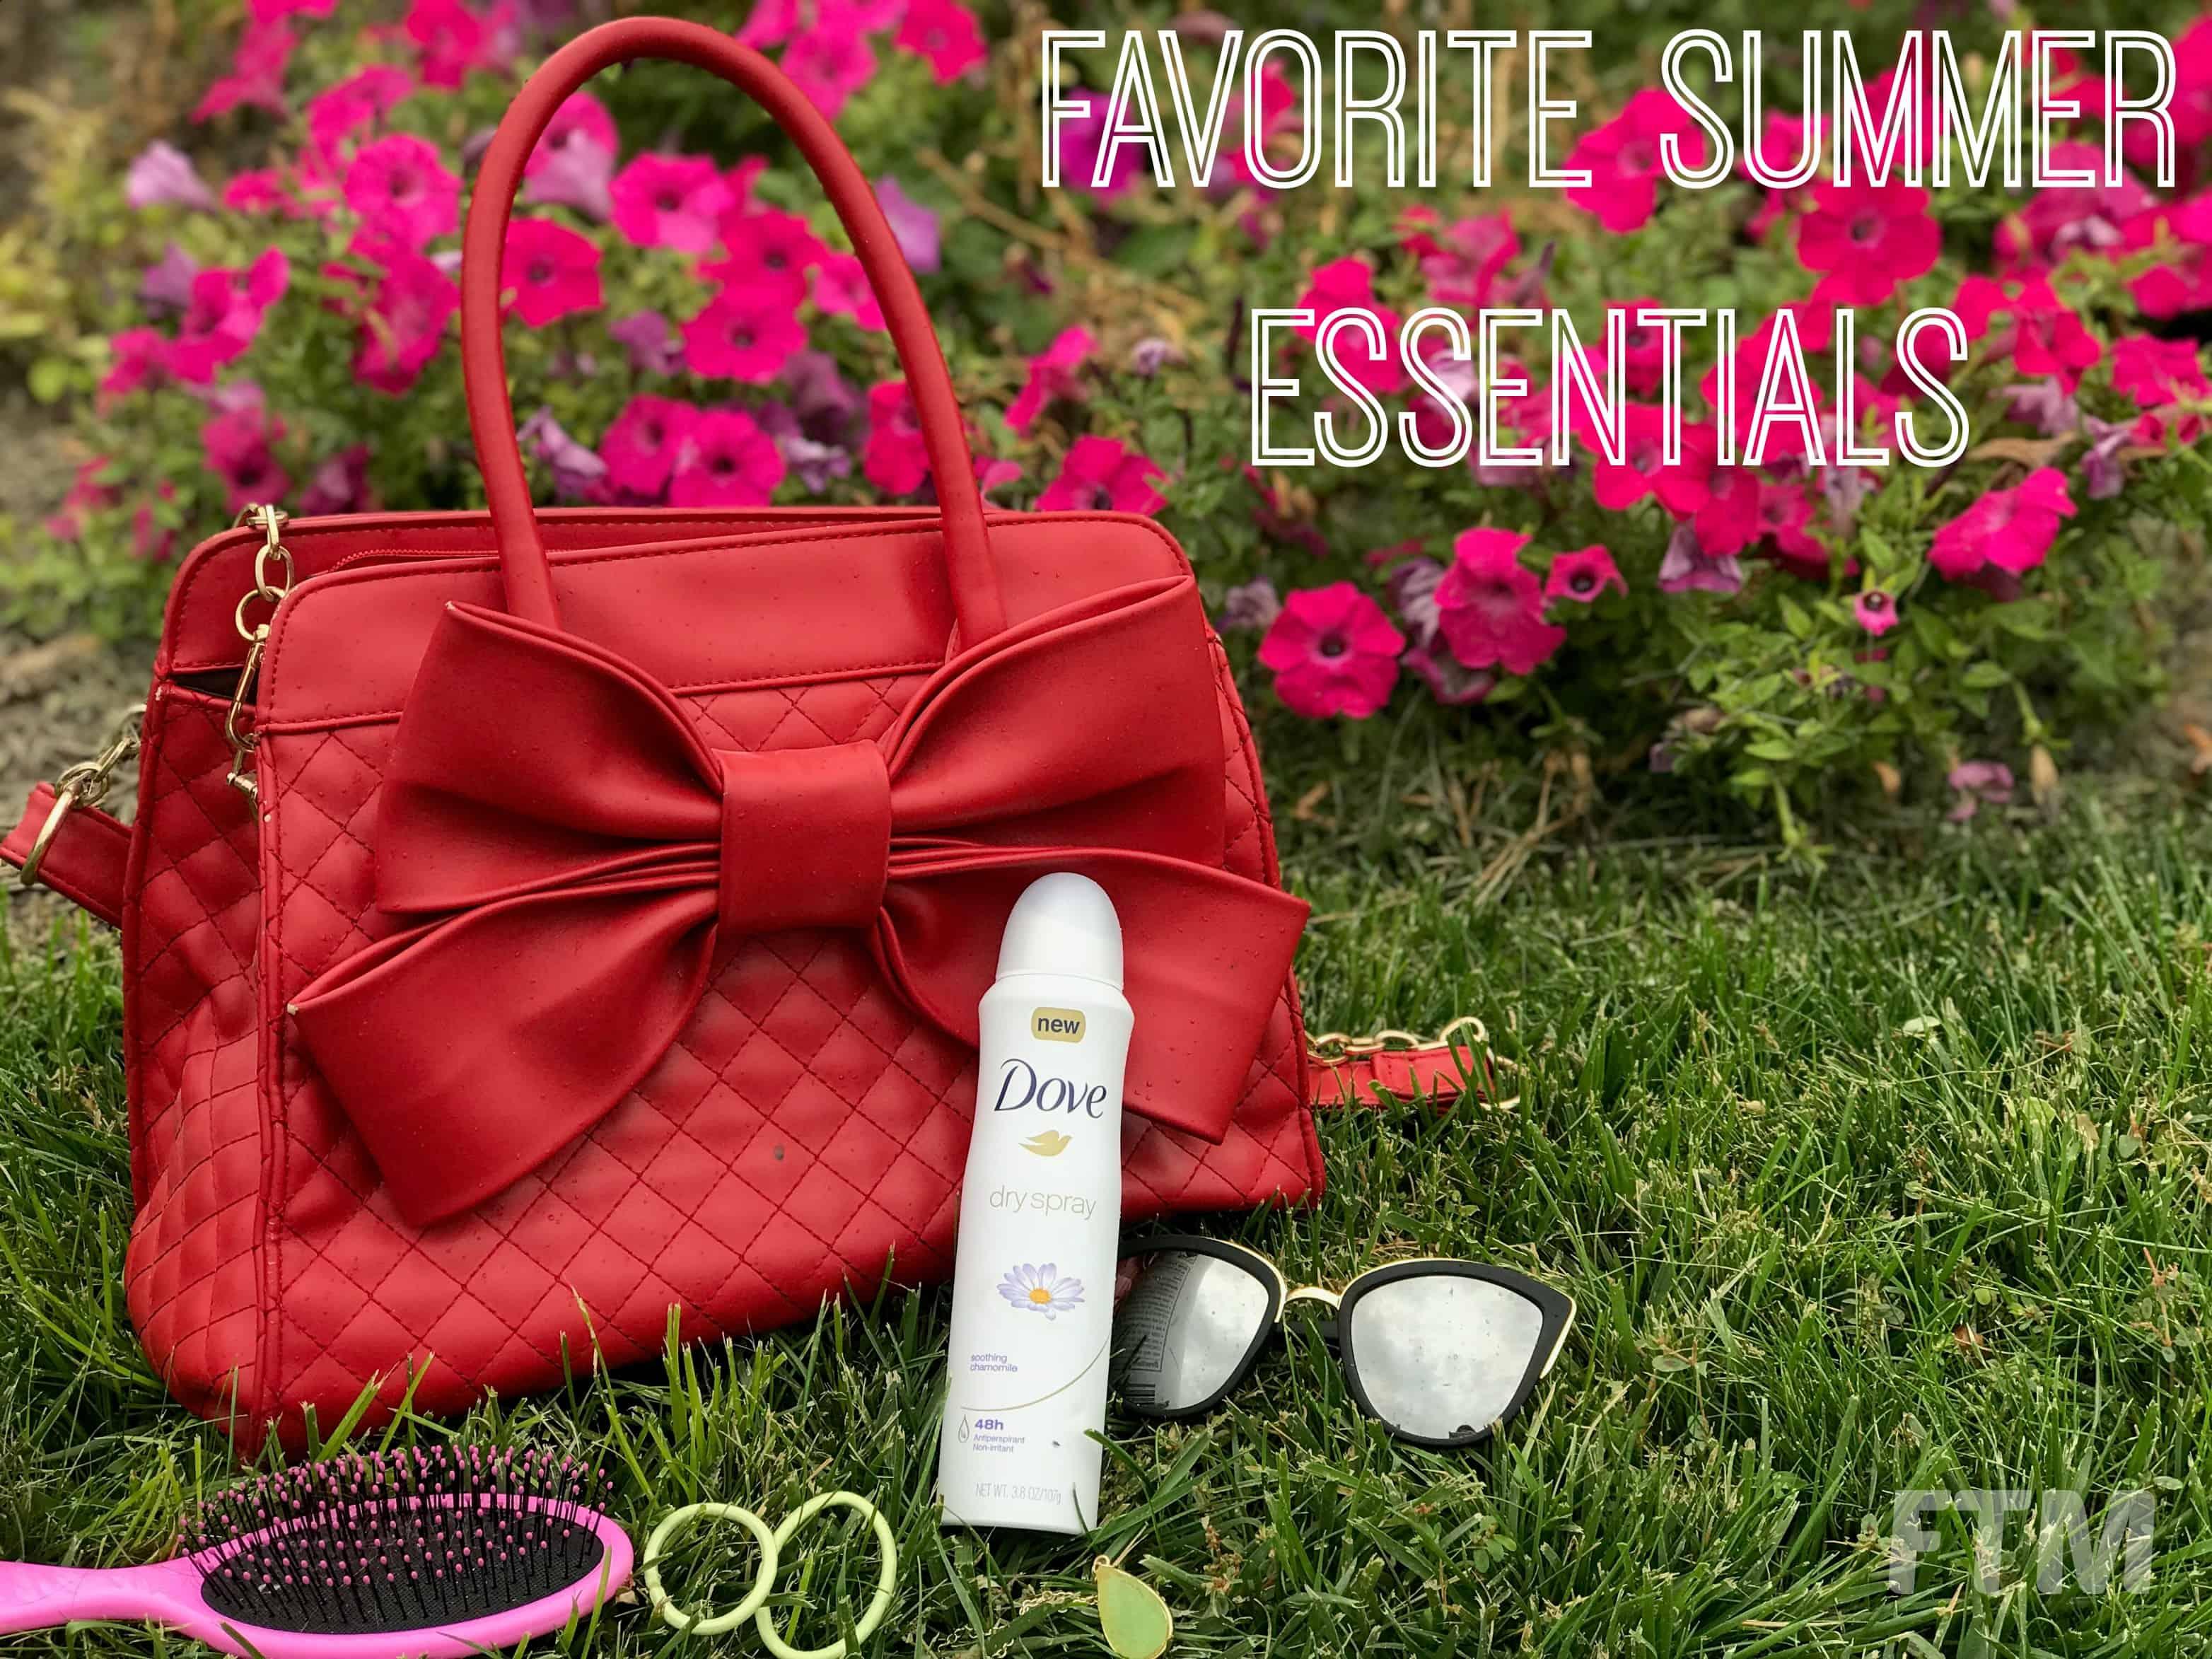 Favorite Summer Concert Essentials